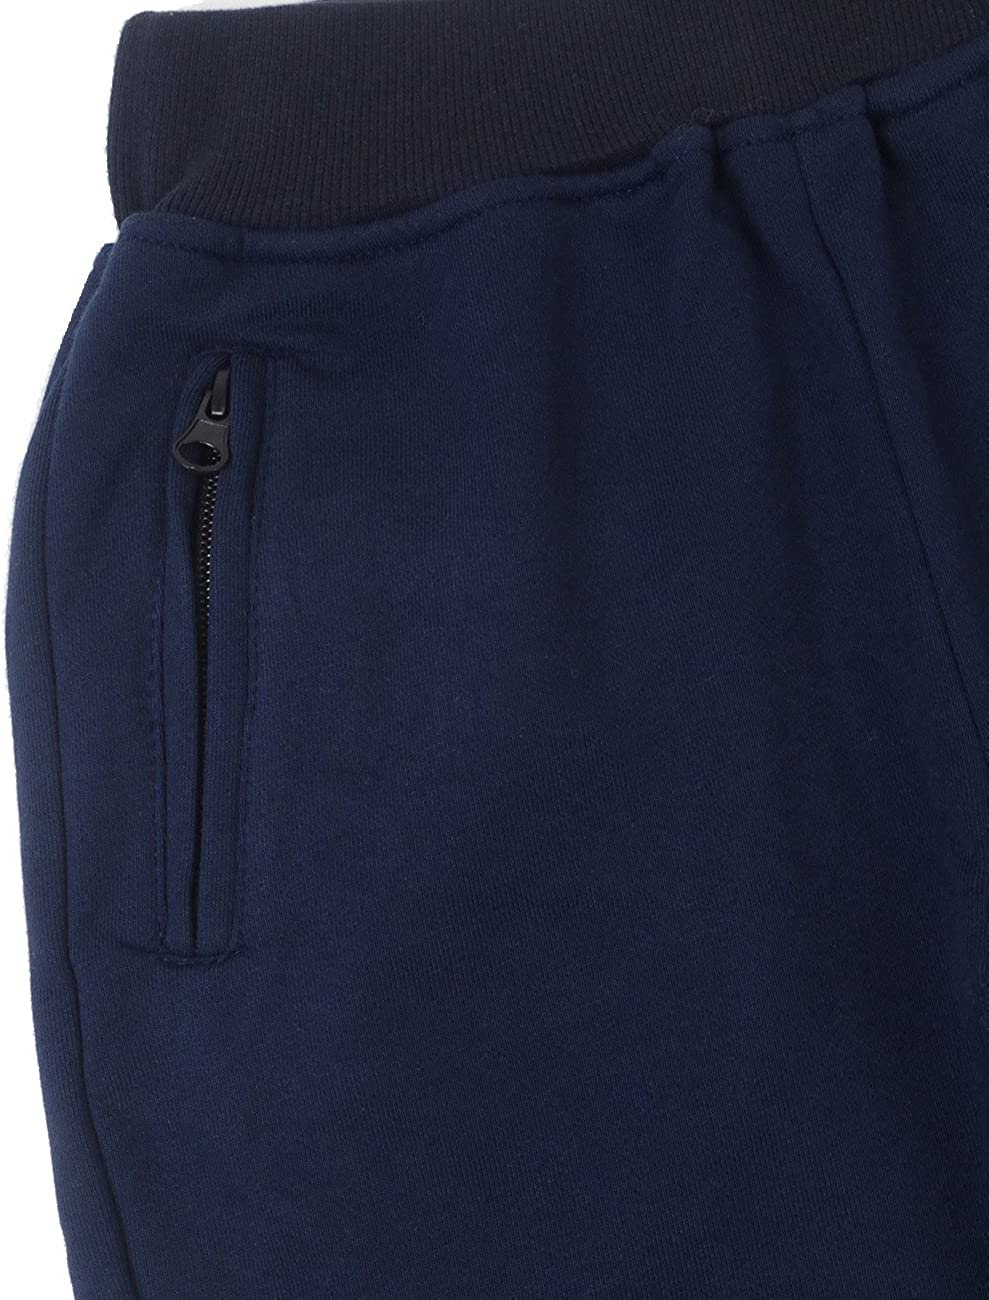 Pantaloncini da ragazzo in morbida spugna francese Spring/&Gege 12 anni 3